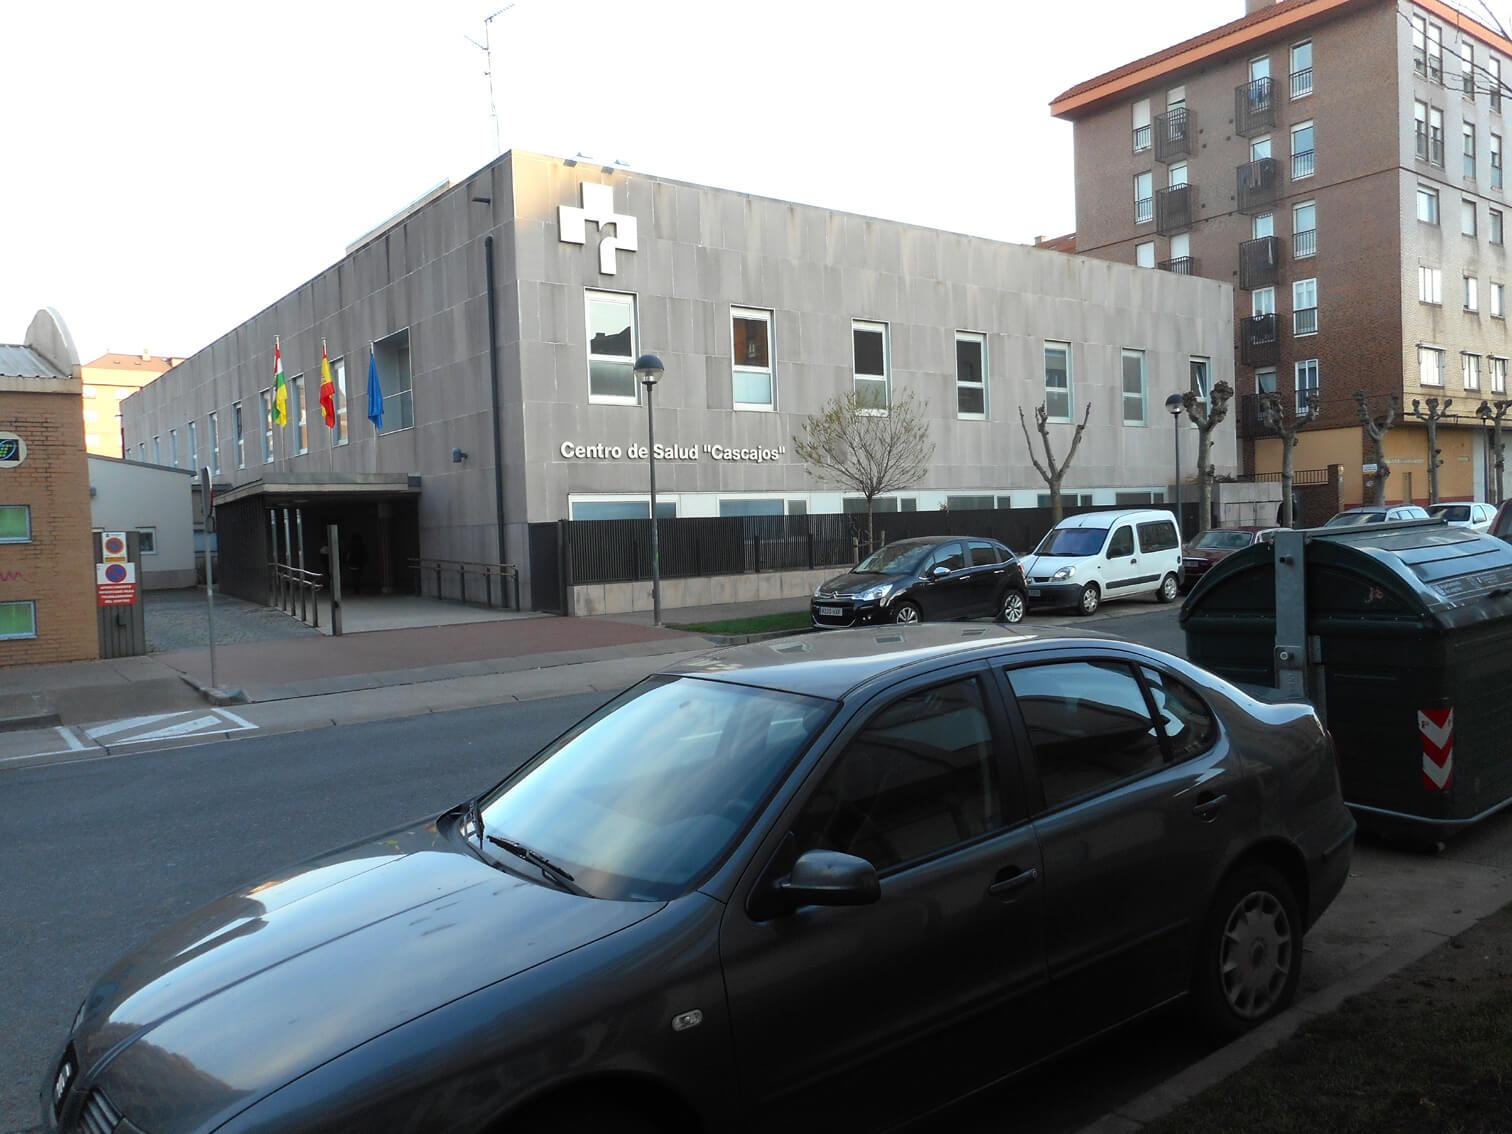 Centro de salud Cascajos